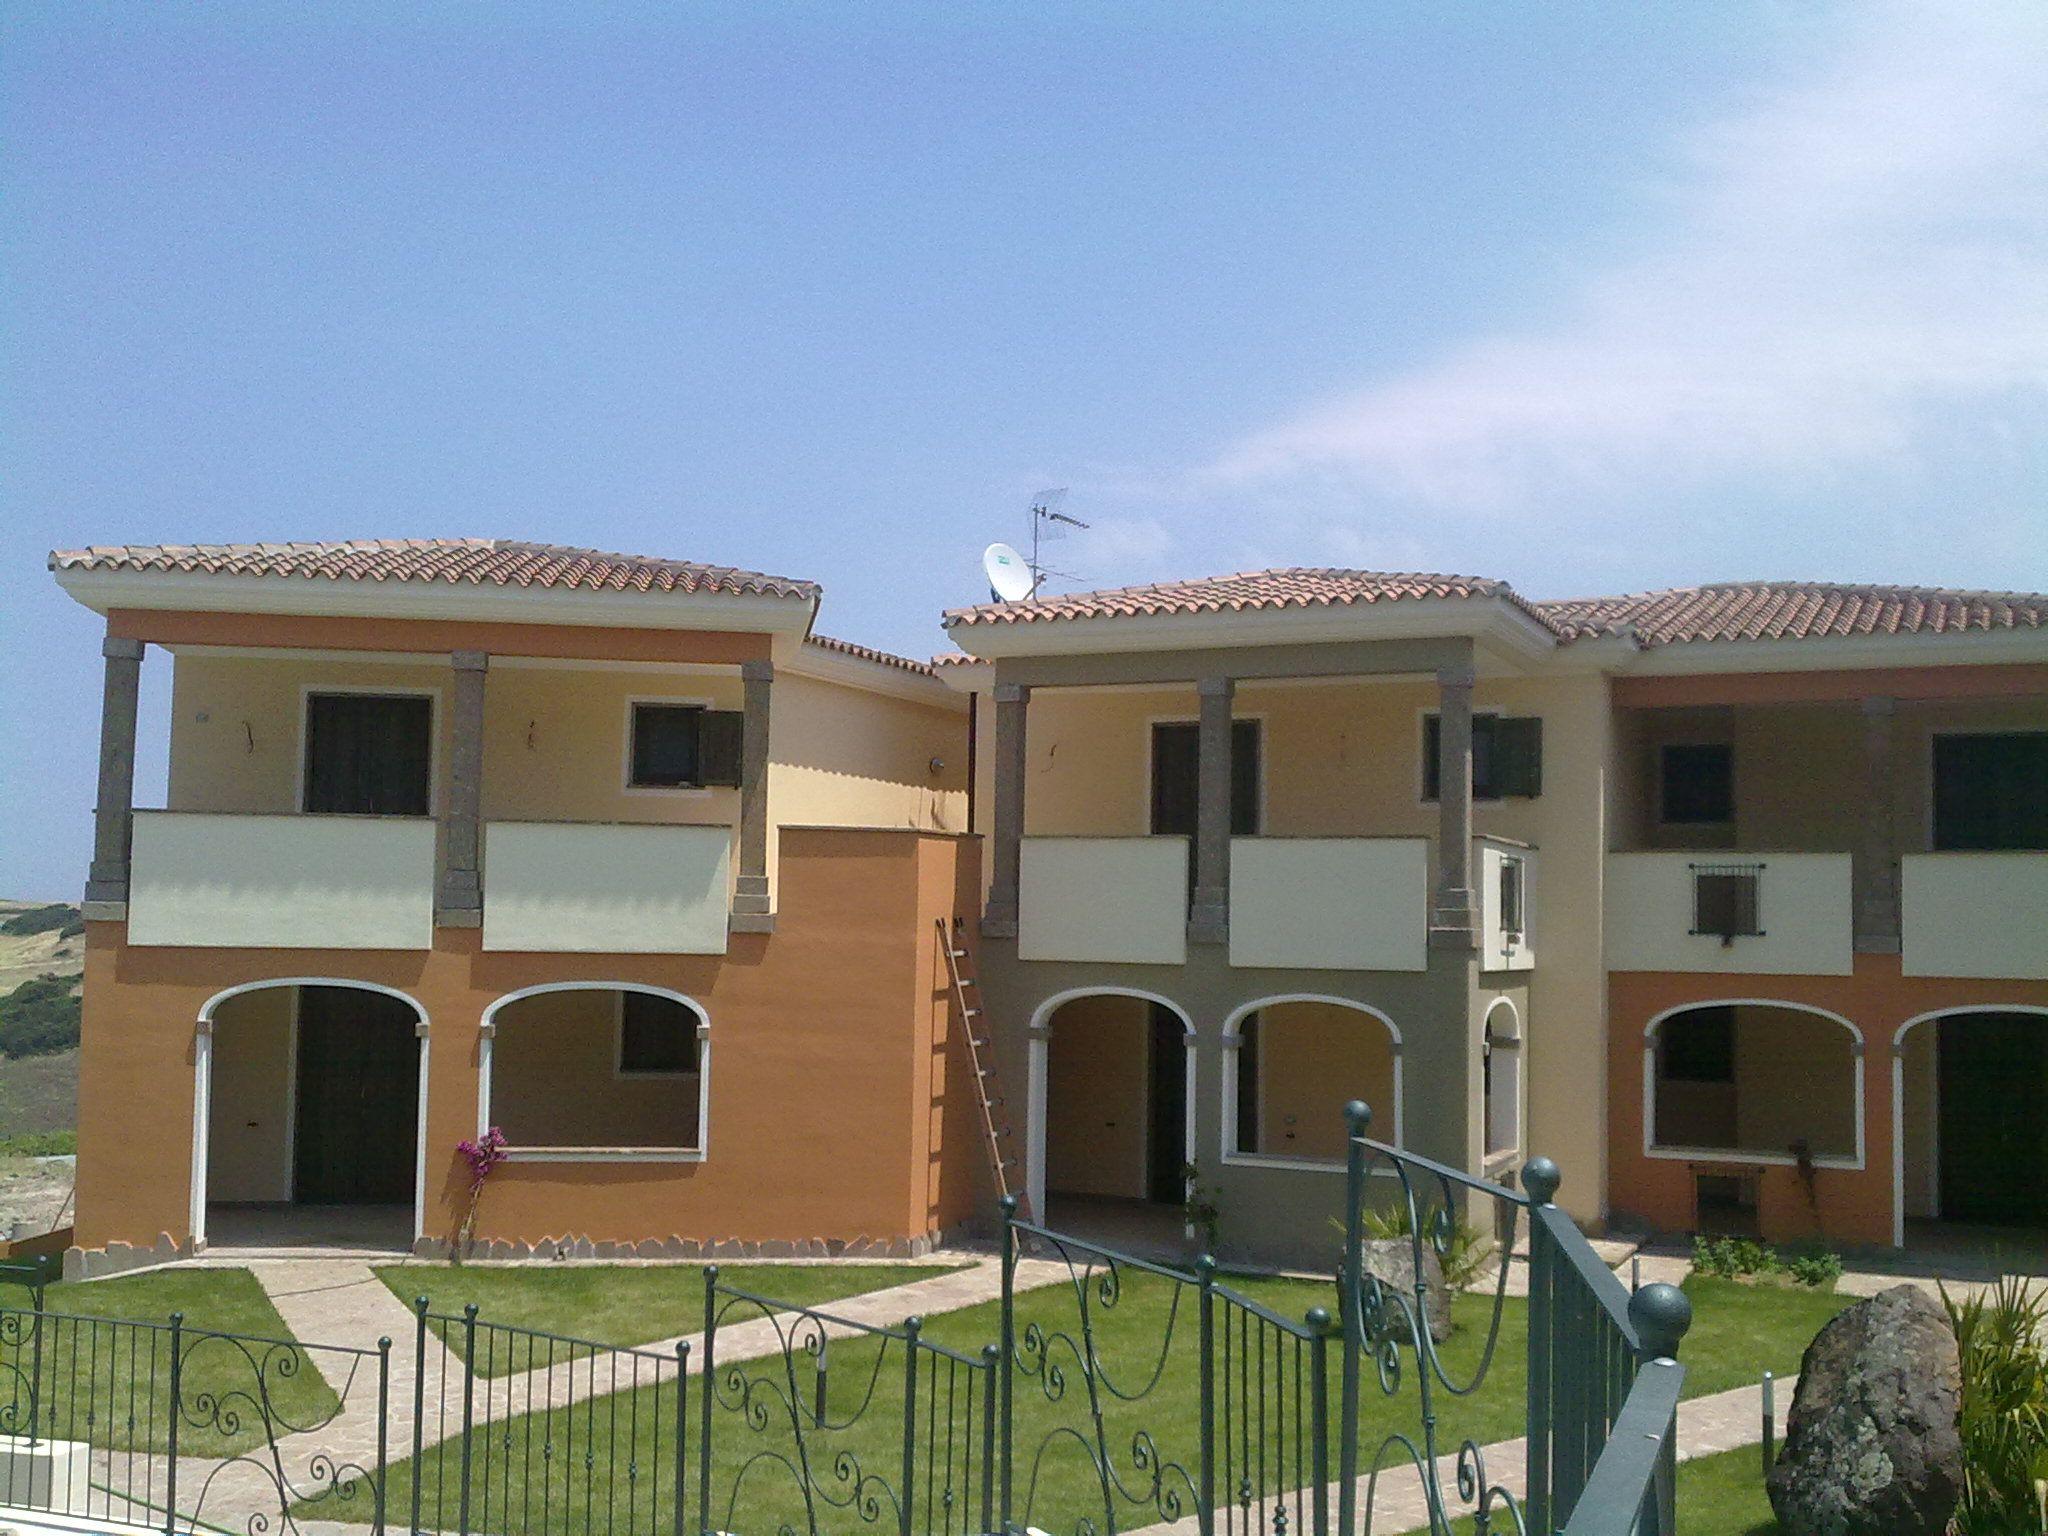 Colorare casa esterno zp77 regardsdefemmes - Colorare casa esterno ...